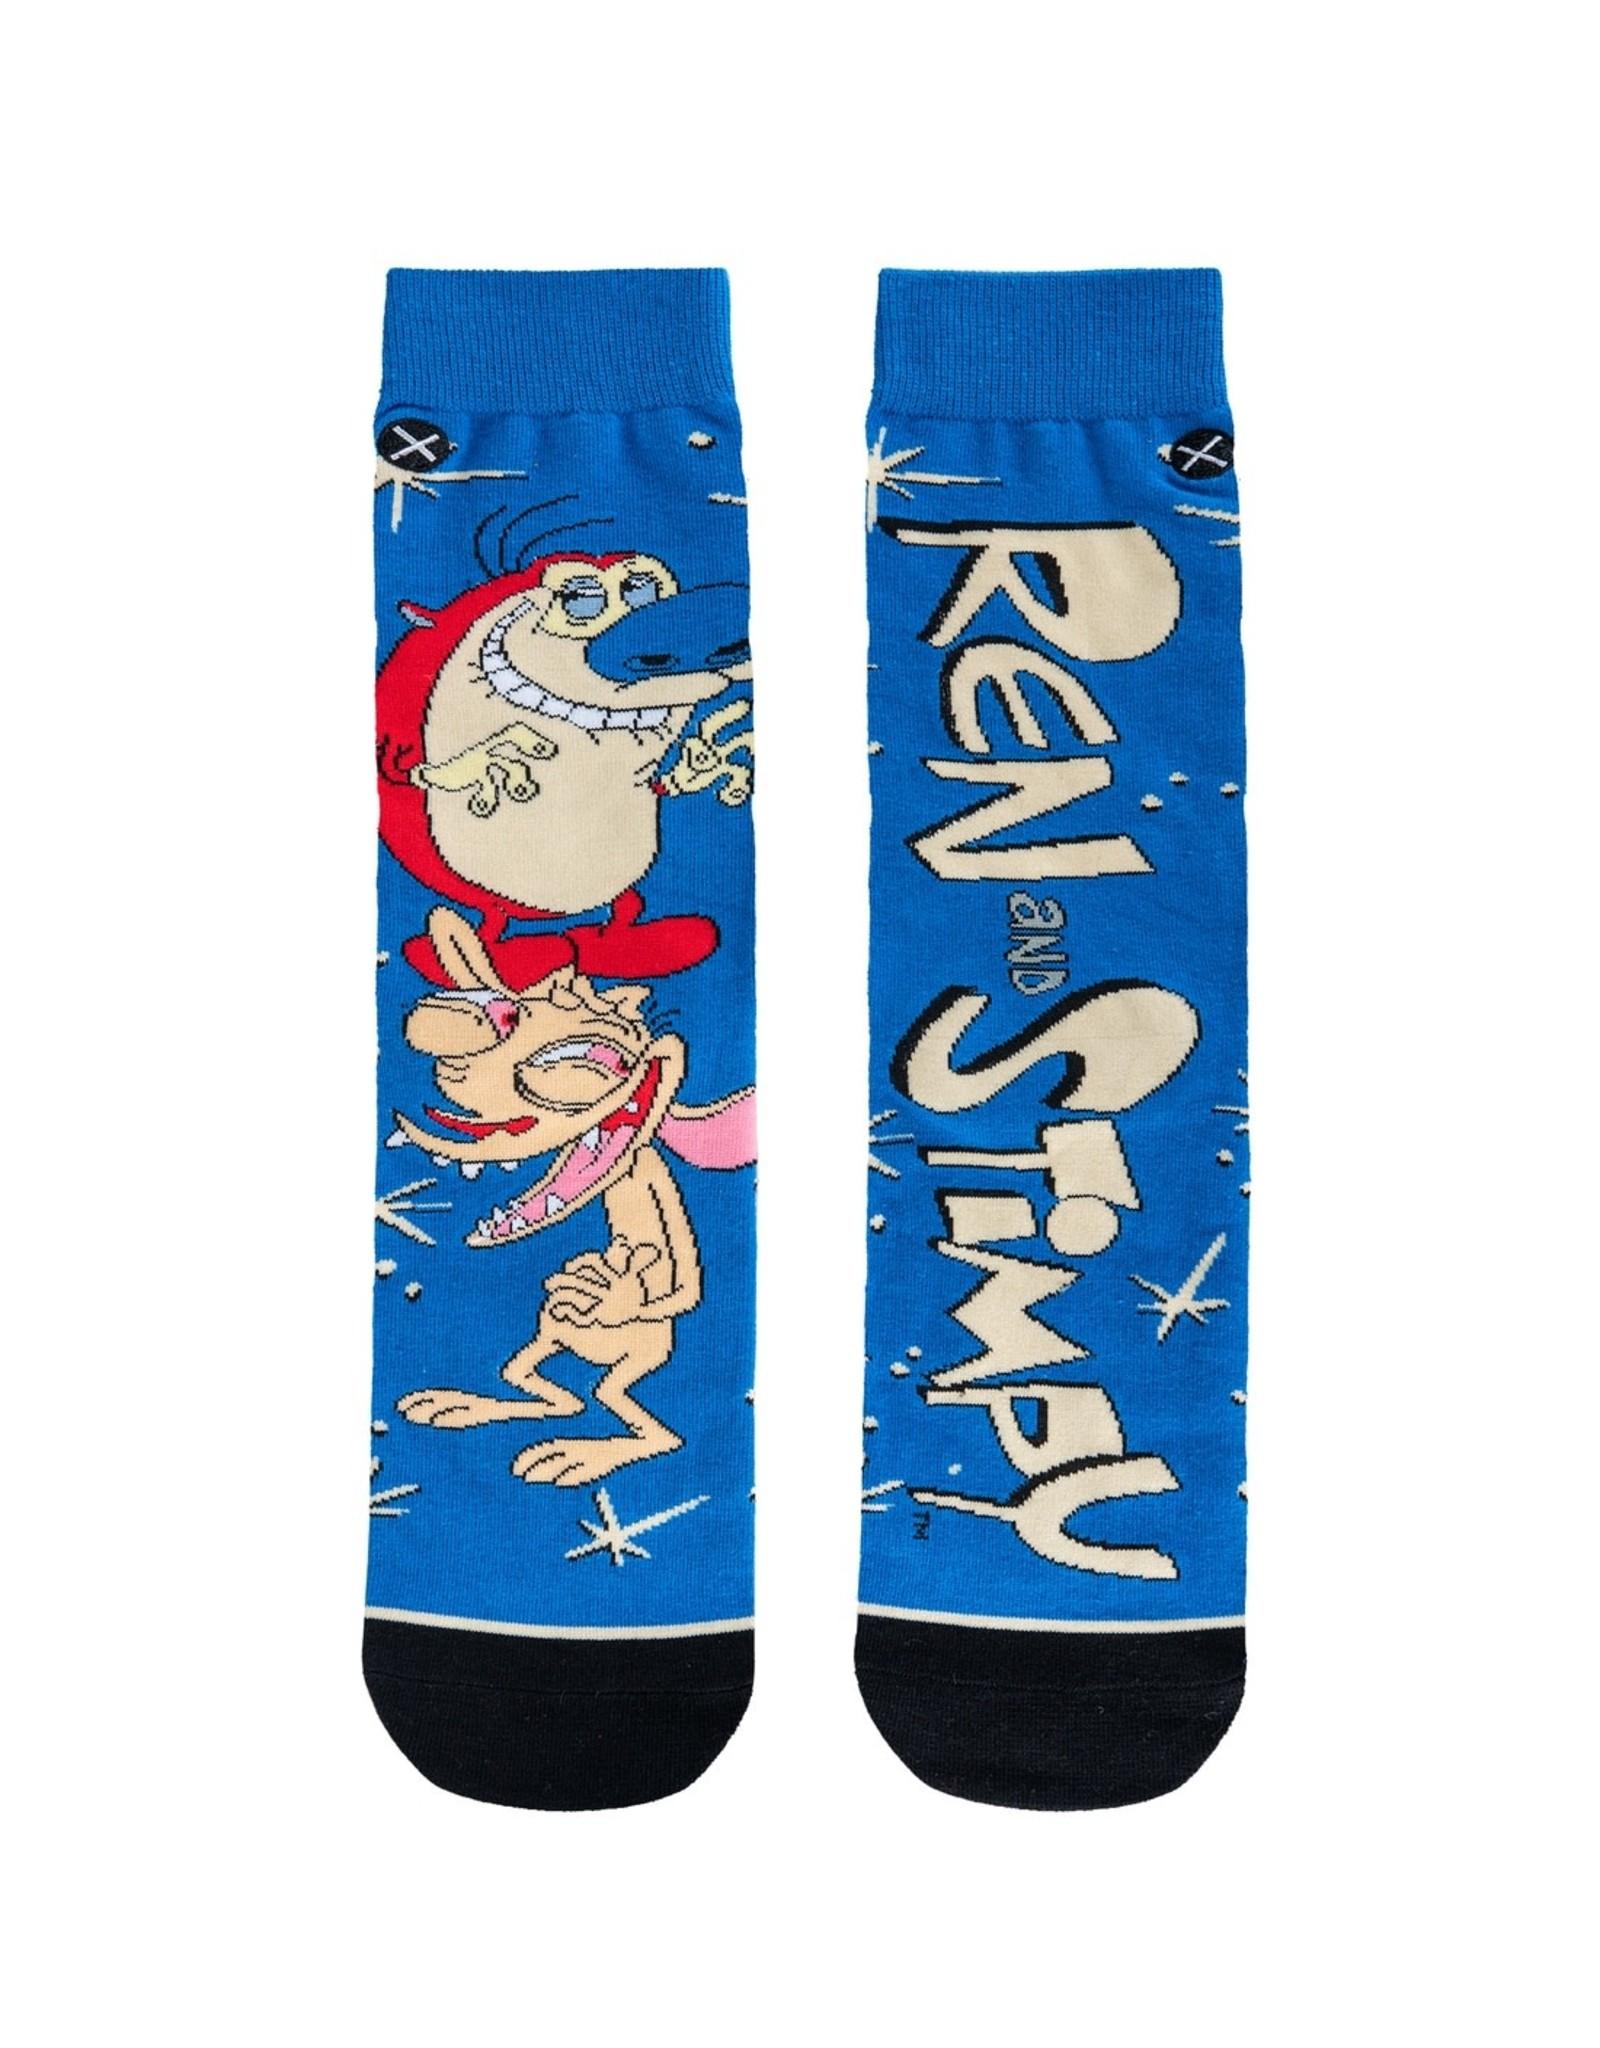 Socks (Unisex) - Ren & Stimpy